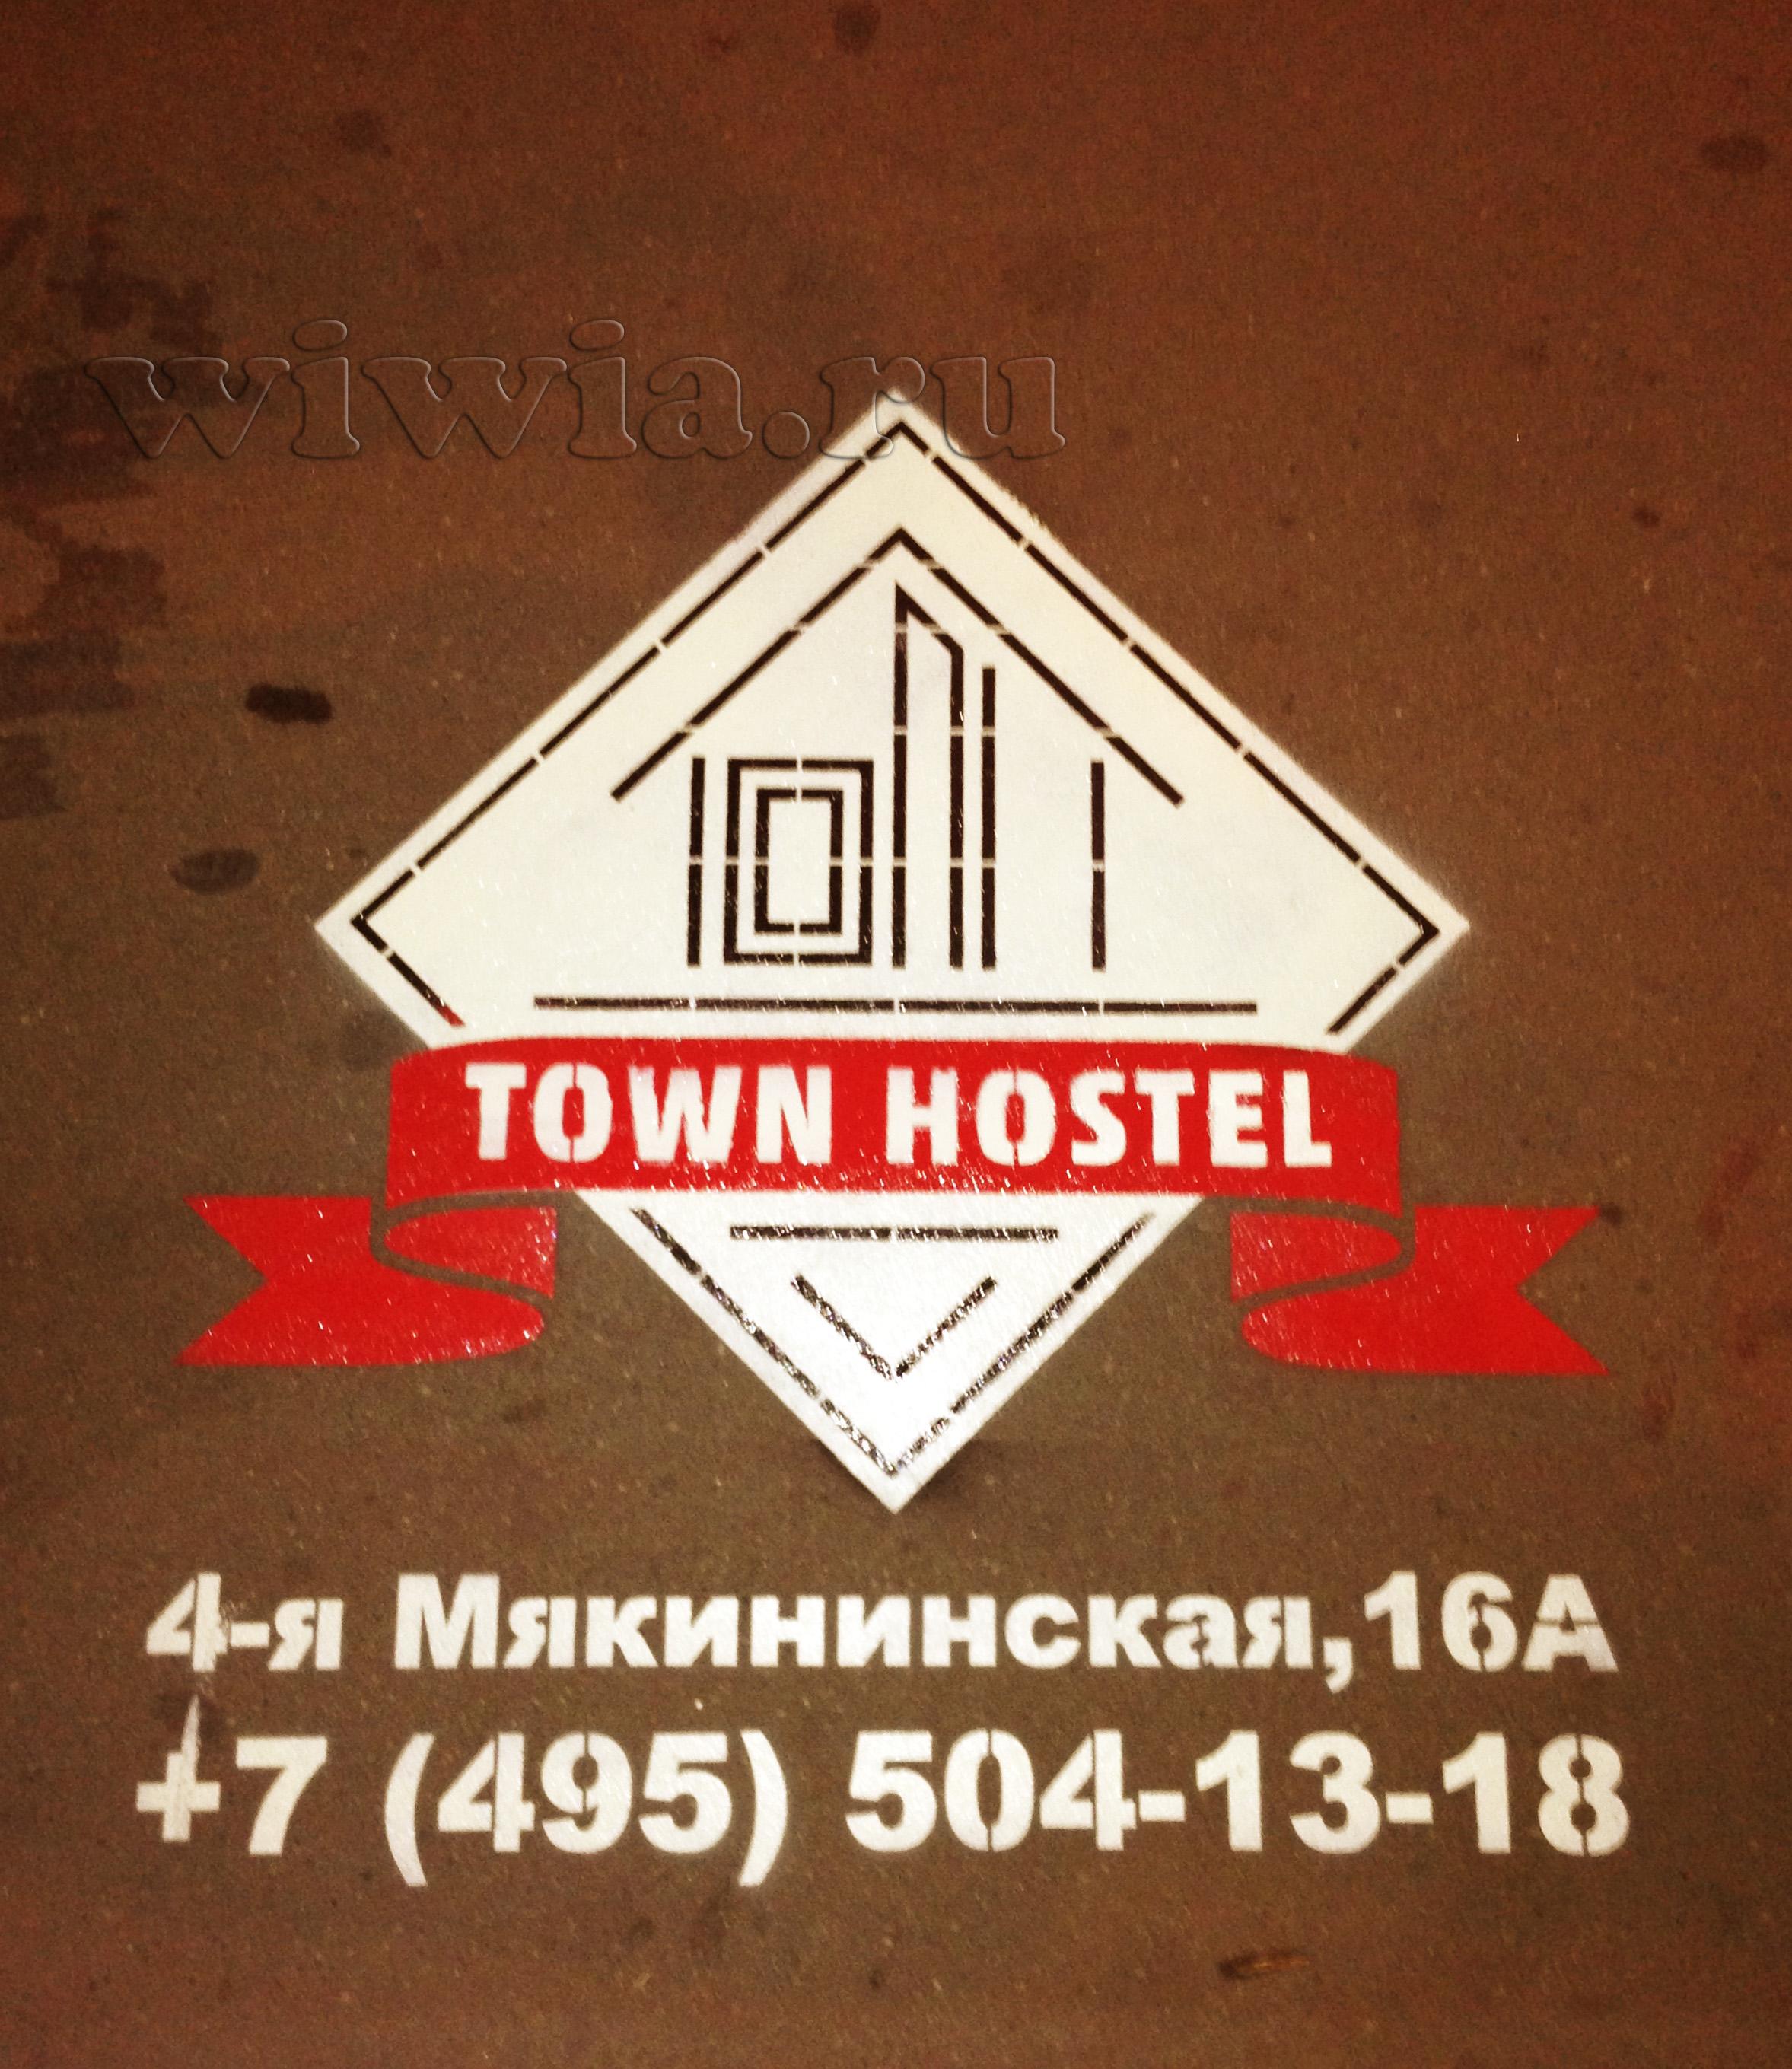 Реклама на асфальте. Логотип хостела